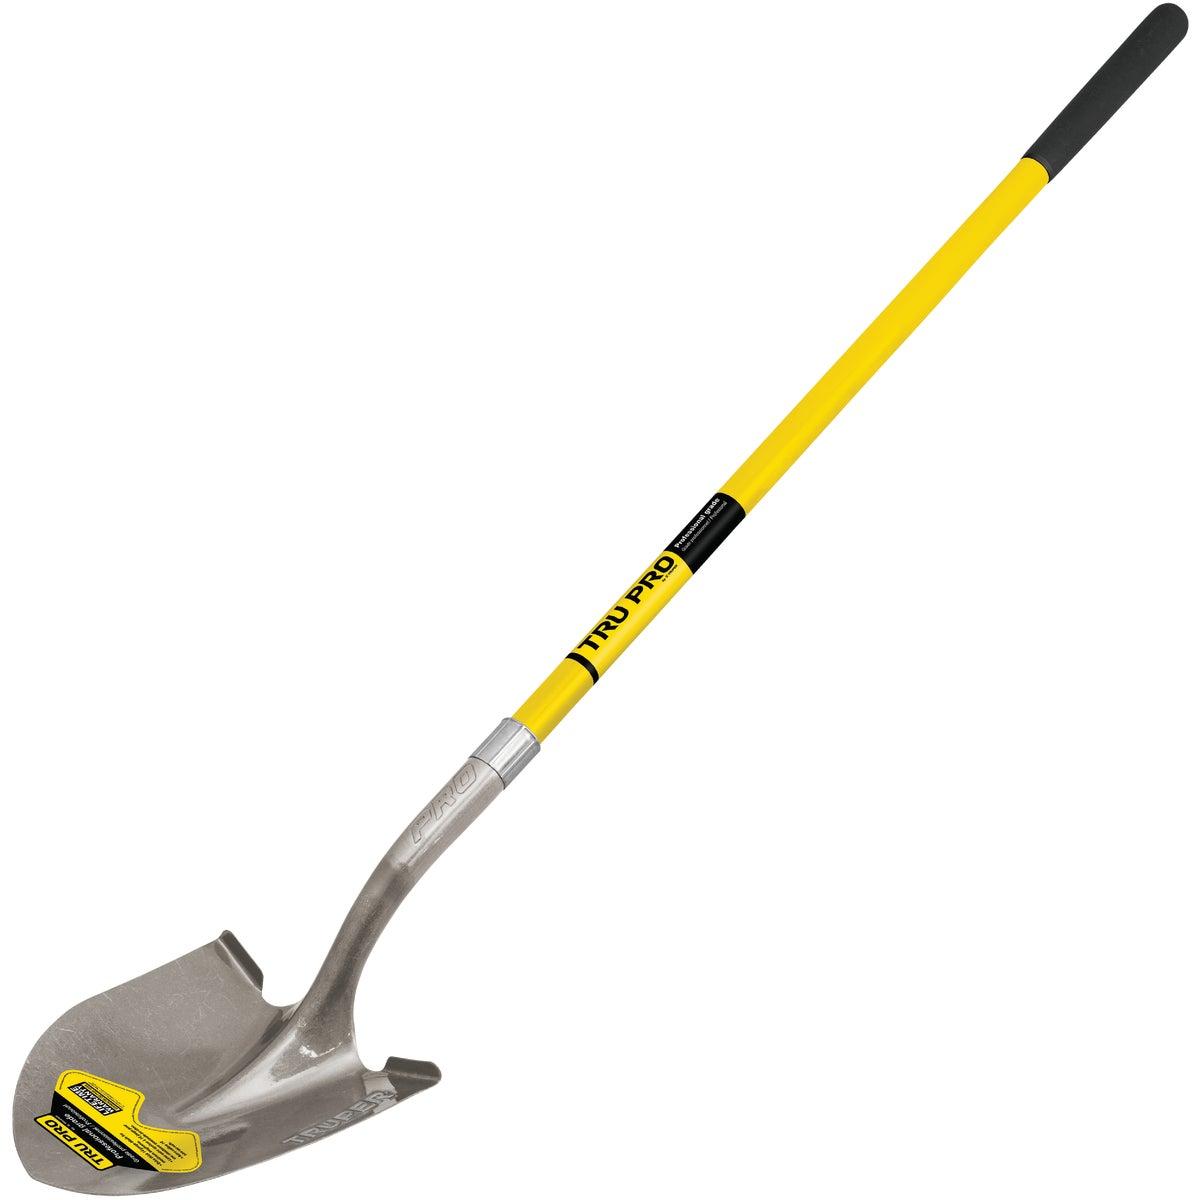 #2 Fg Hdl Lhrp Shovel